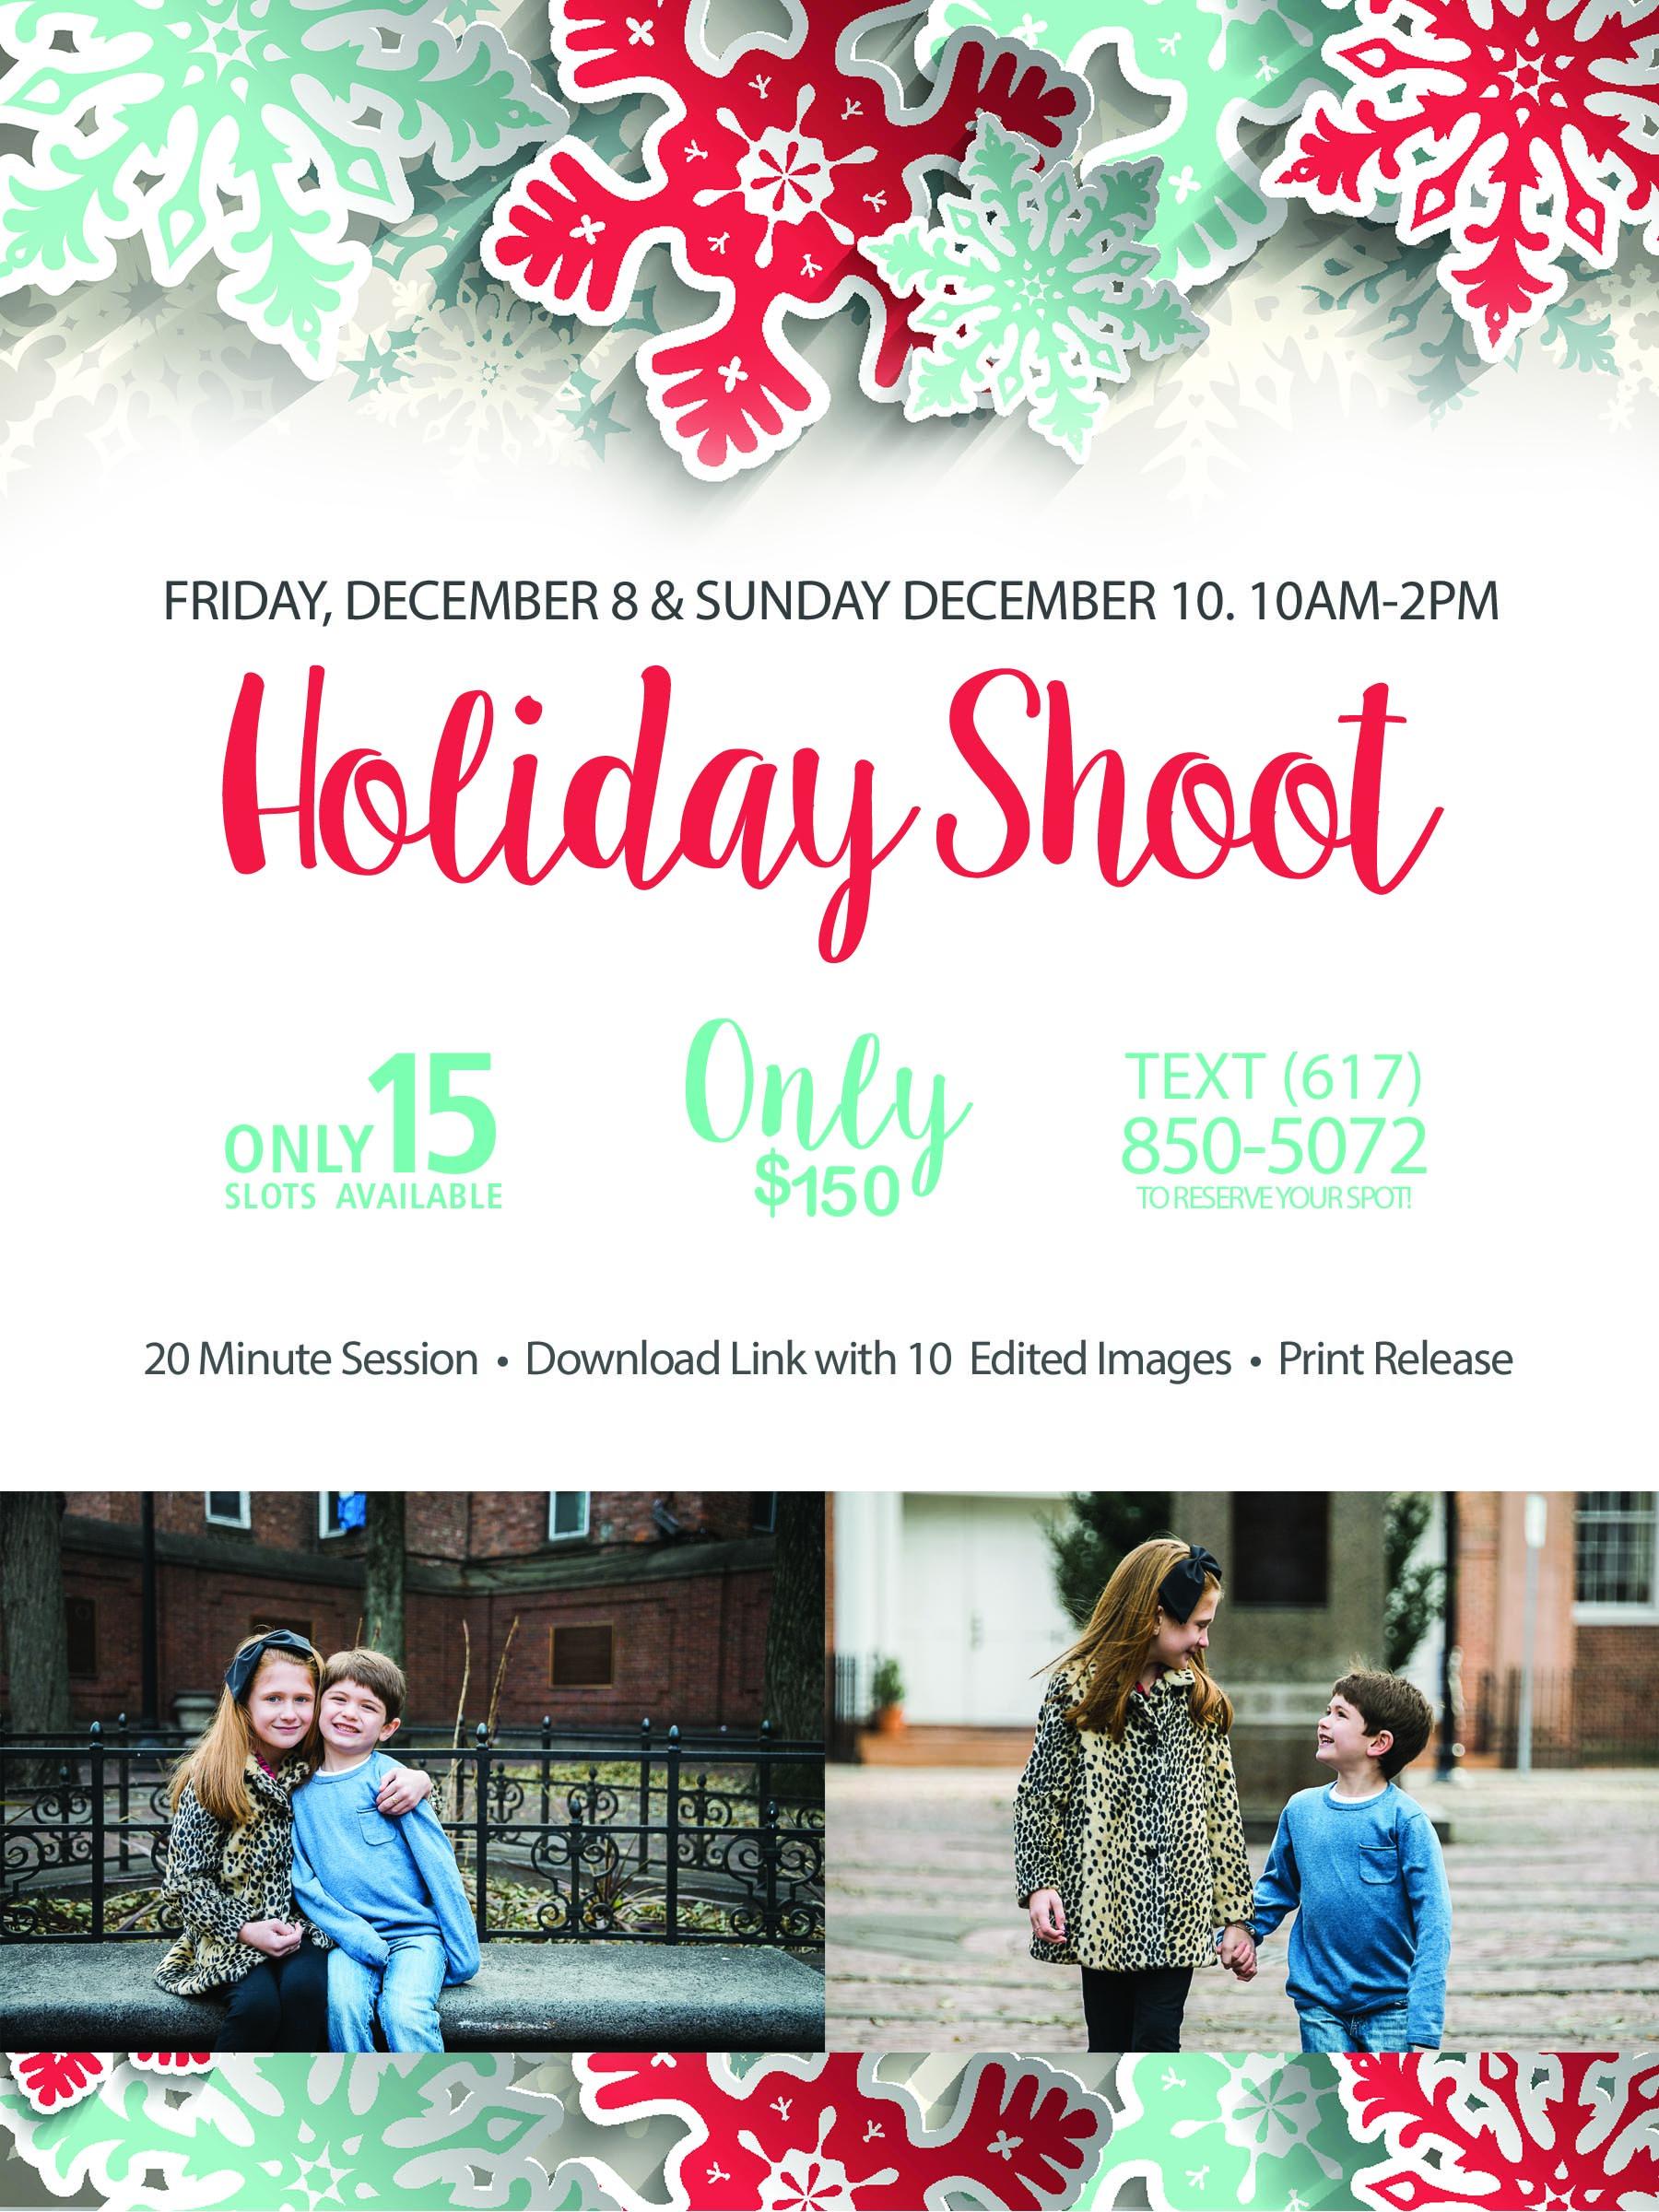 Holiday Shoot 1draft.jpg